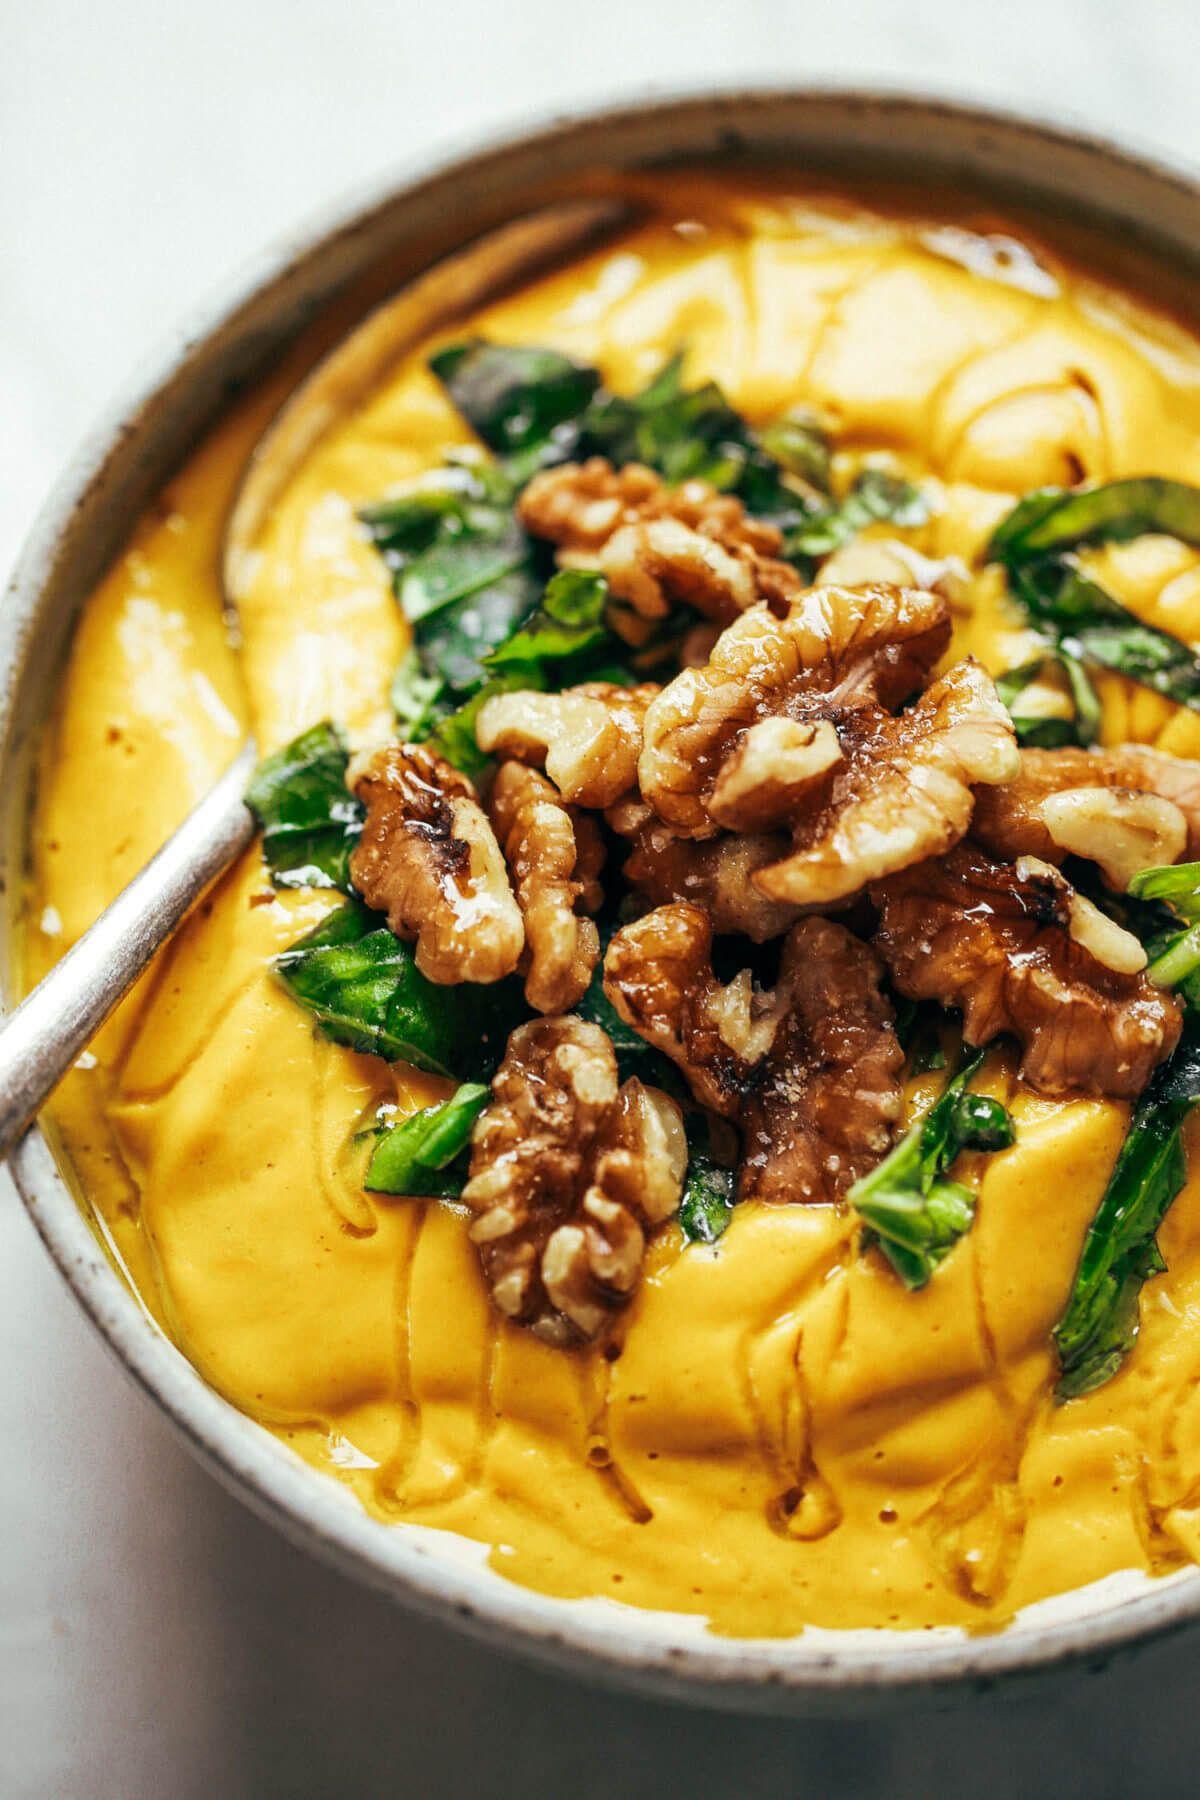 Golden Turmeric Vegetable Soup Recipe Veg cutlet